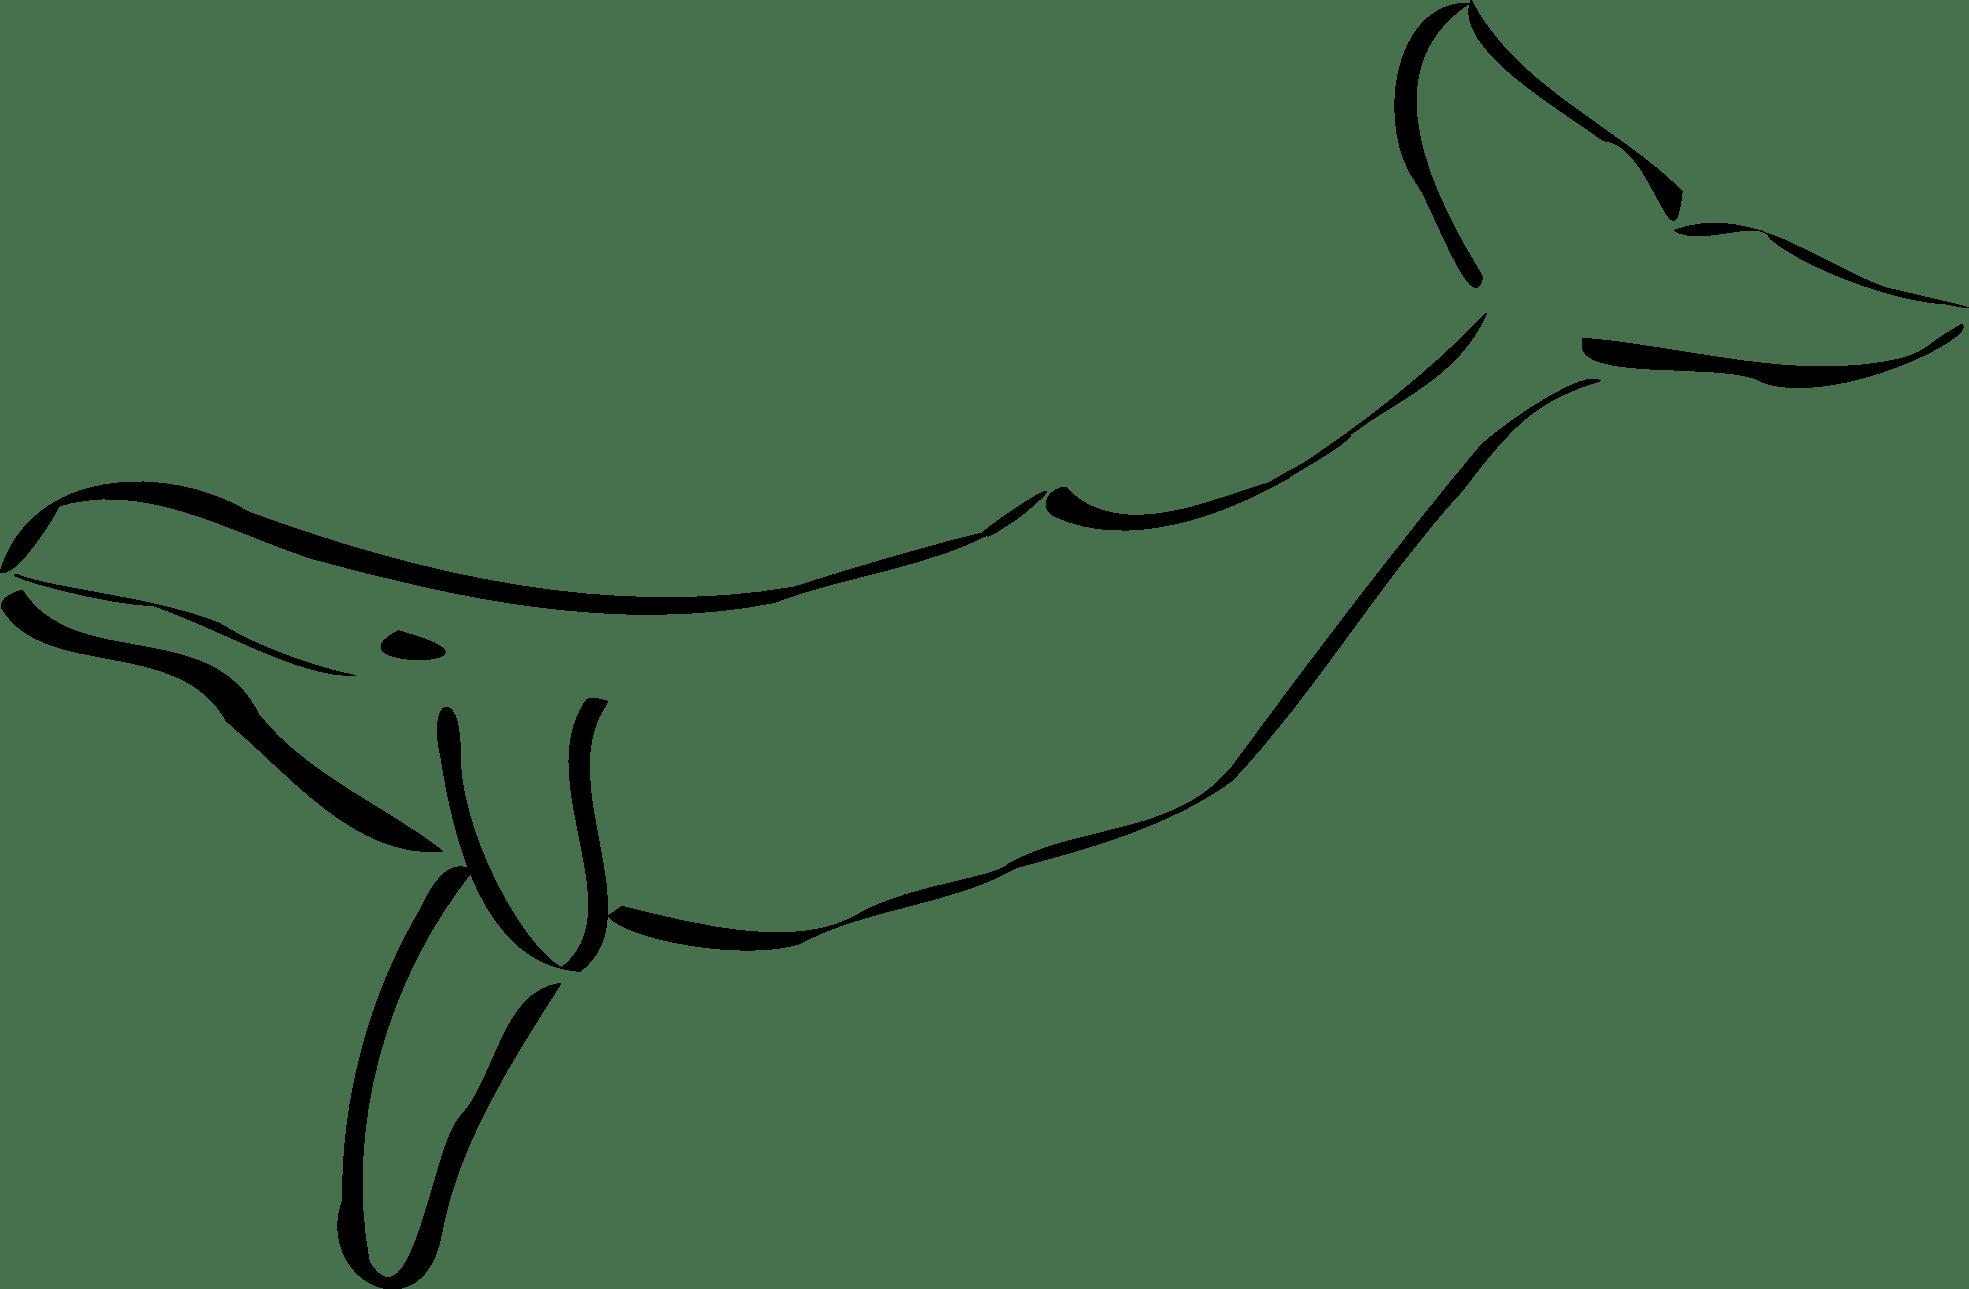 Clipart Whale Walrus Clipart Whale Walrus Transparent